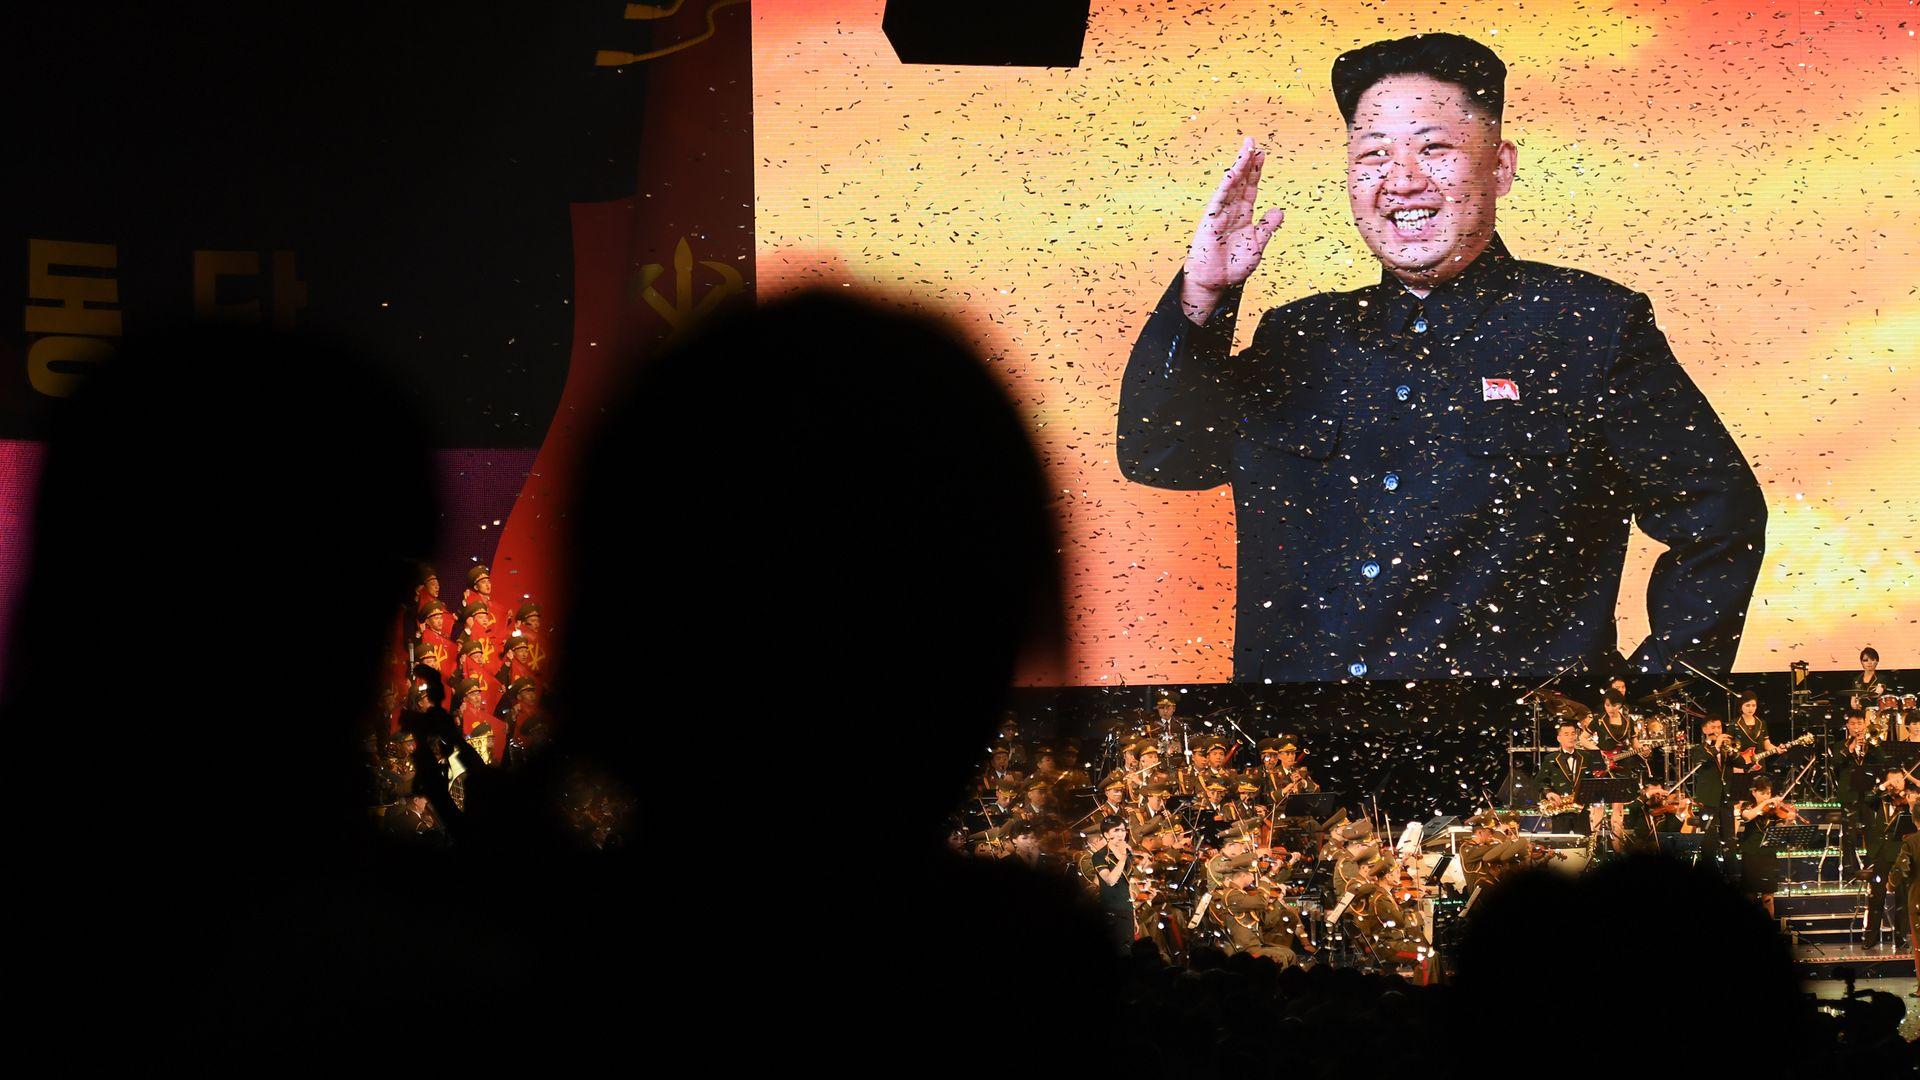 Kim Jong-un image.